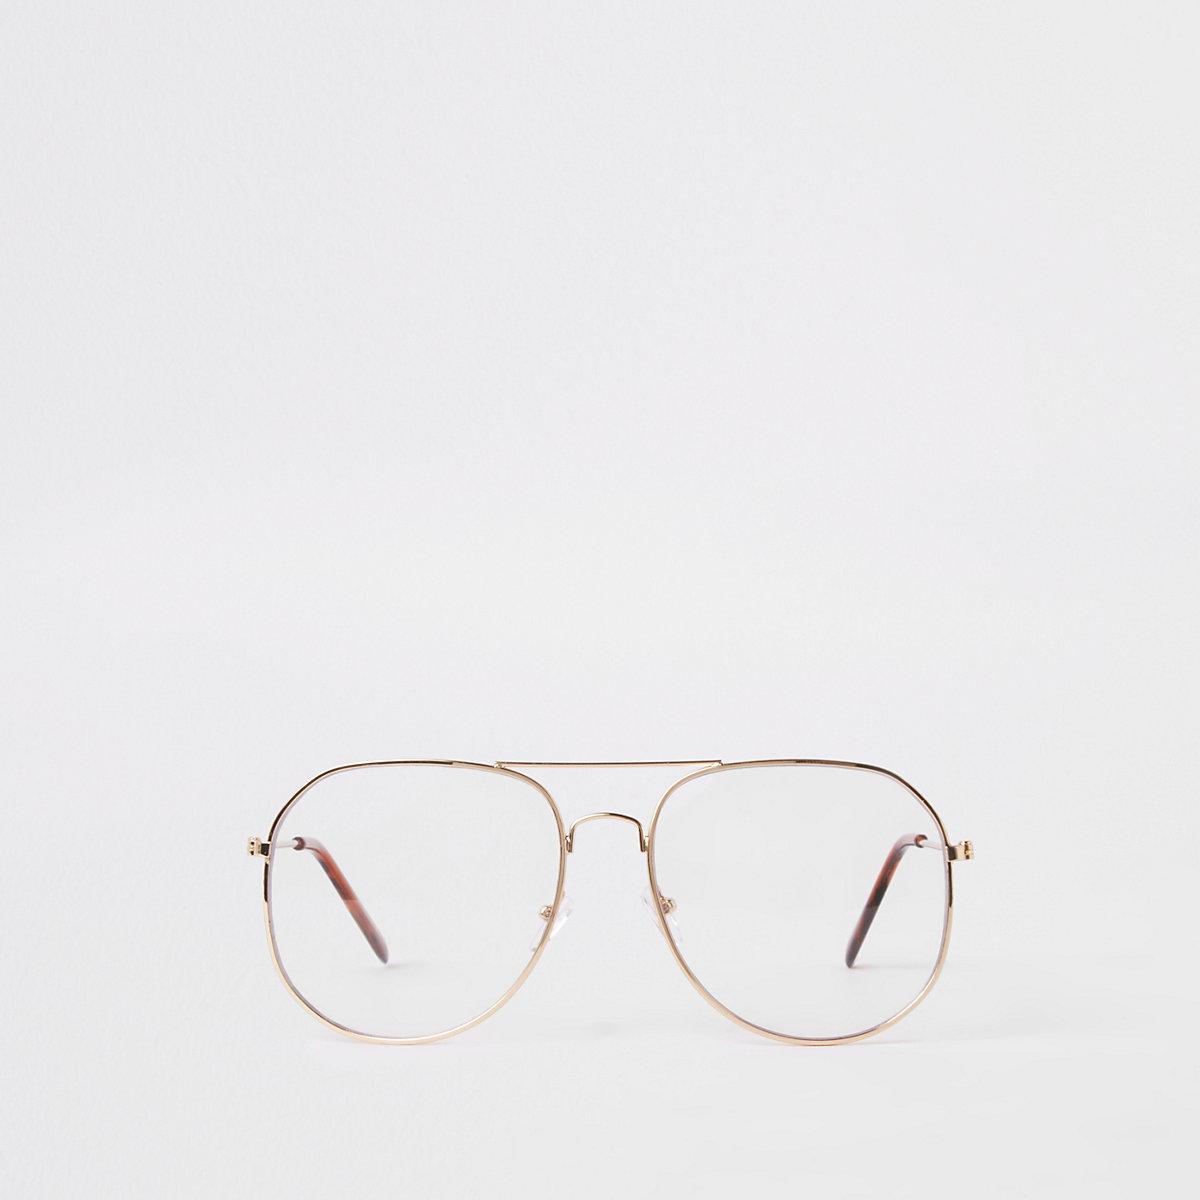 Gold tone aviator glasses